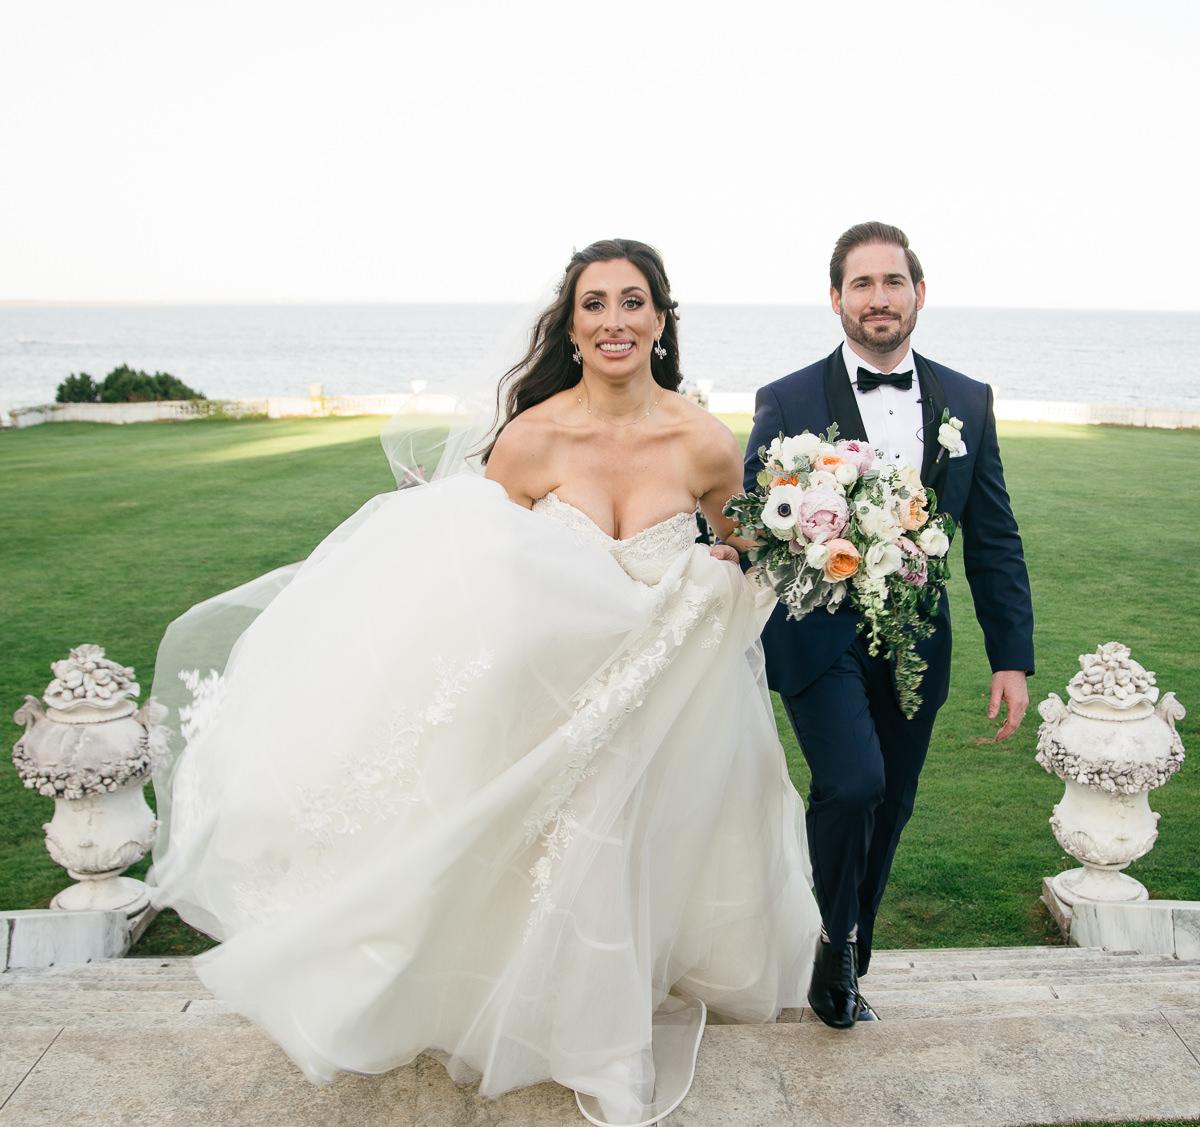 gilded-mansion-wedding-rosecliff-1003